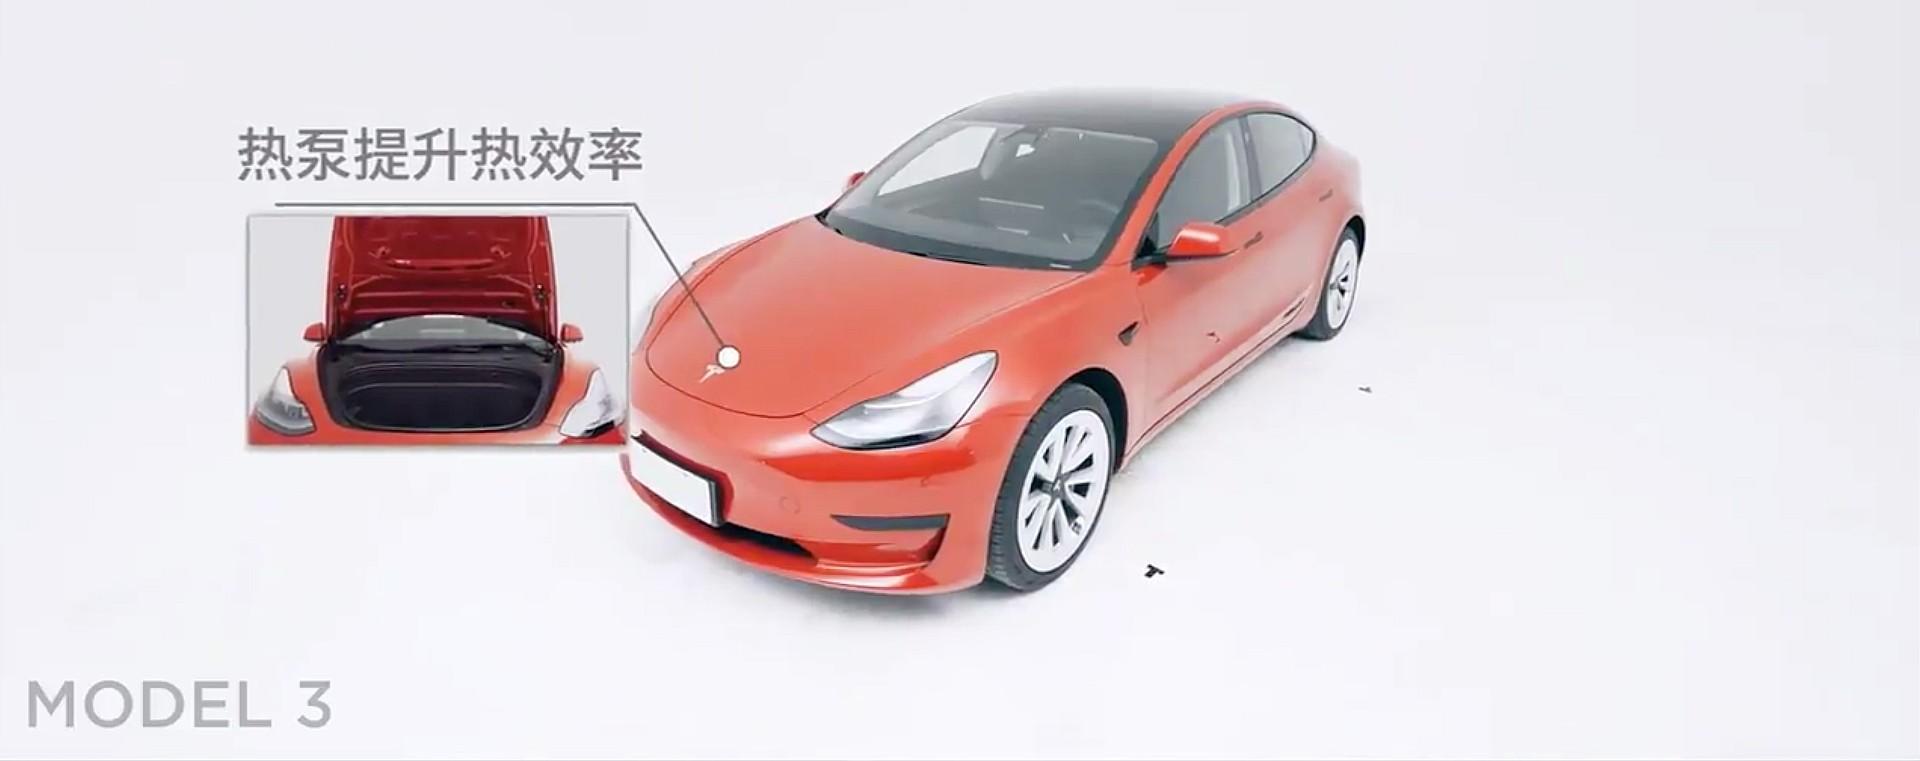 tesla-china-model-3-video-marketing